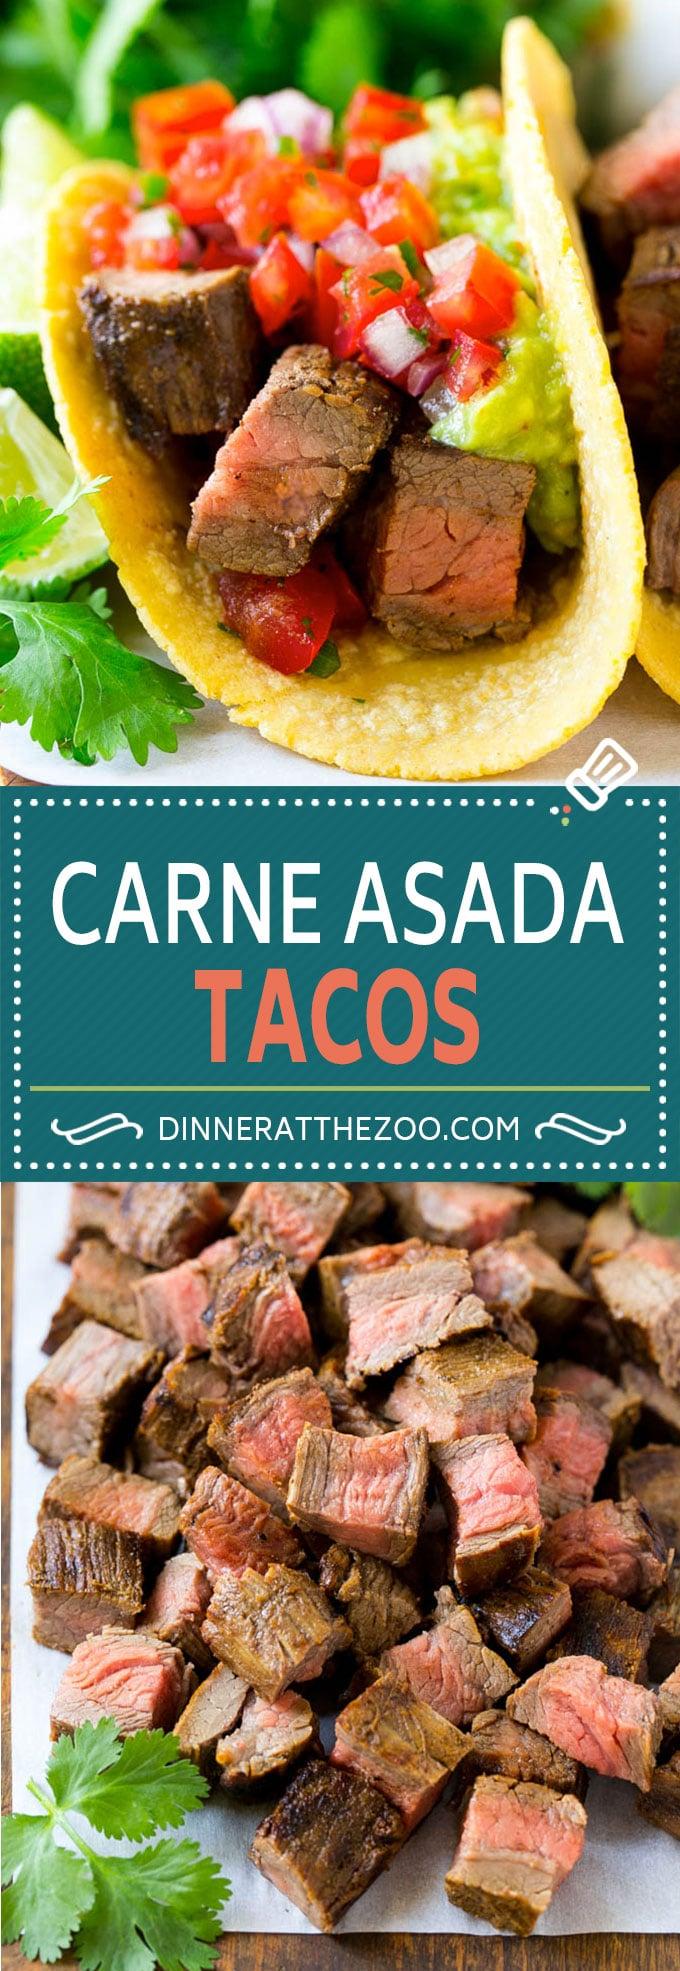 Carne Asada Tacos Recipe | Steak Tacos | Beef Tacos | Carne Asada